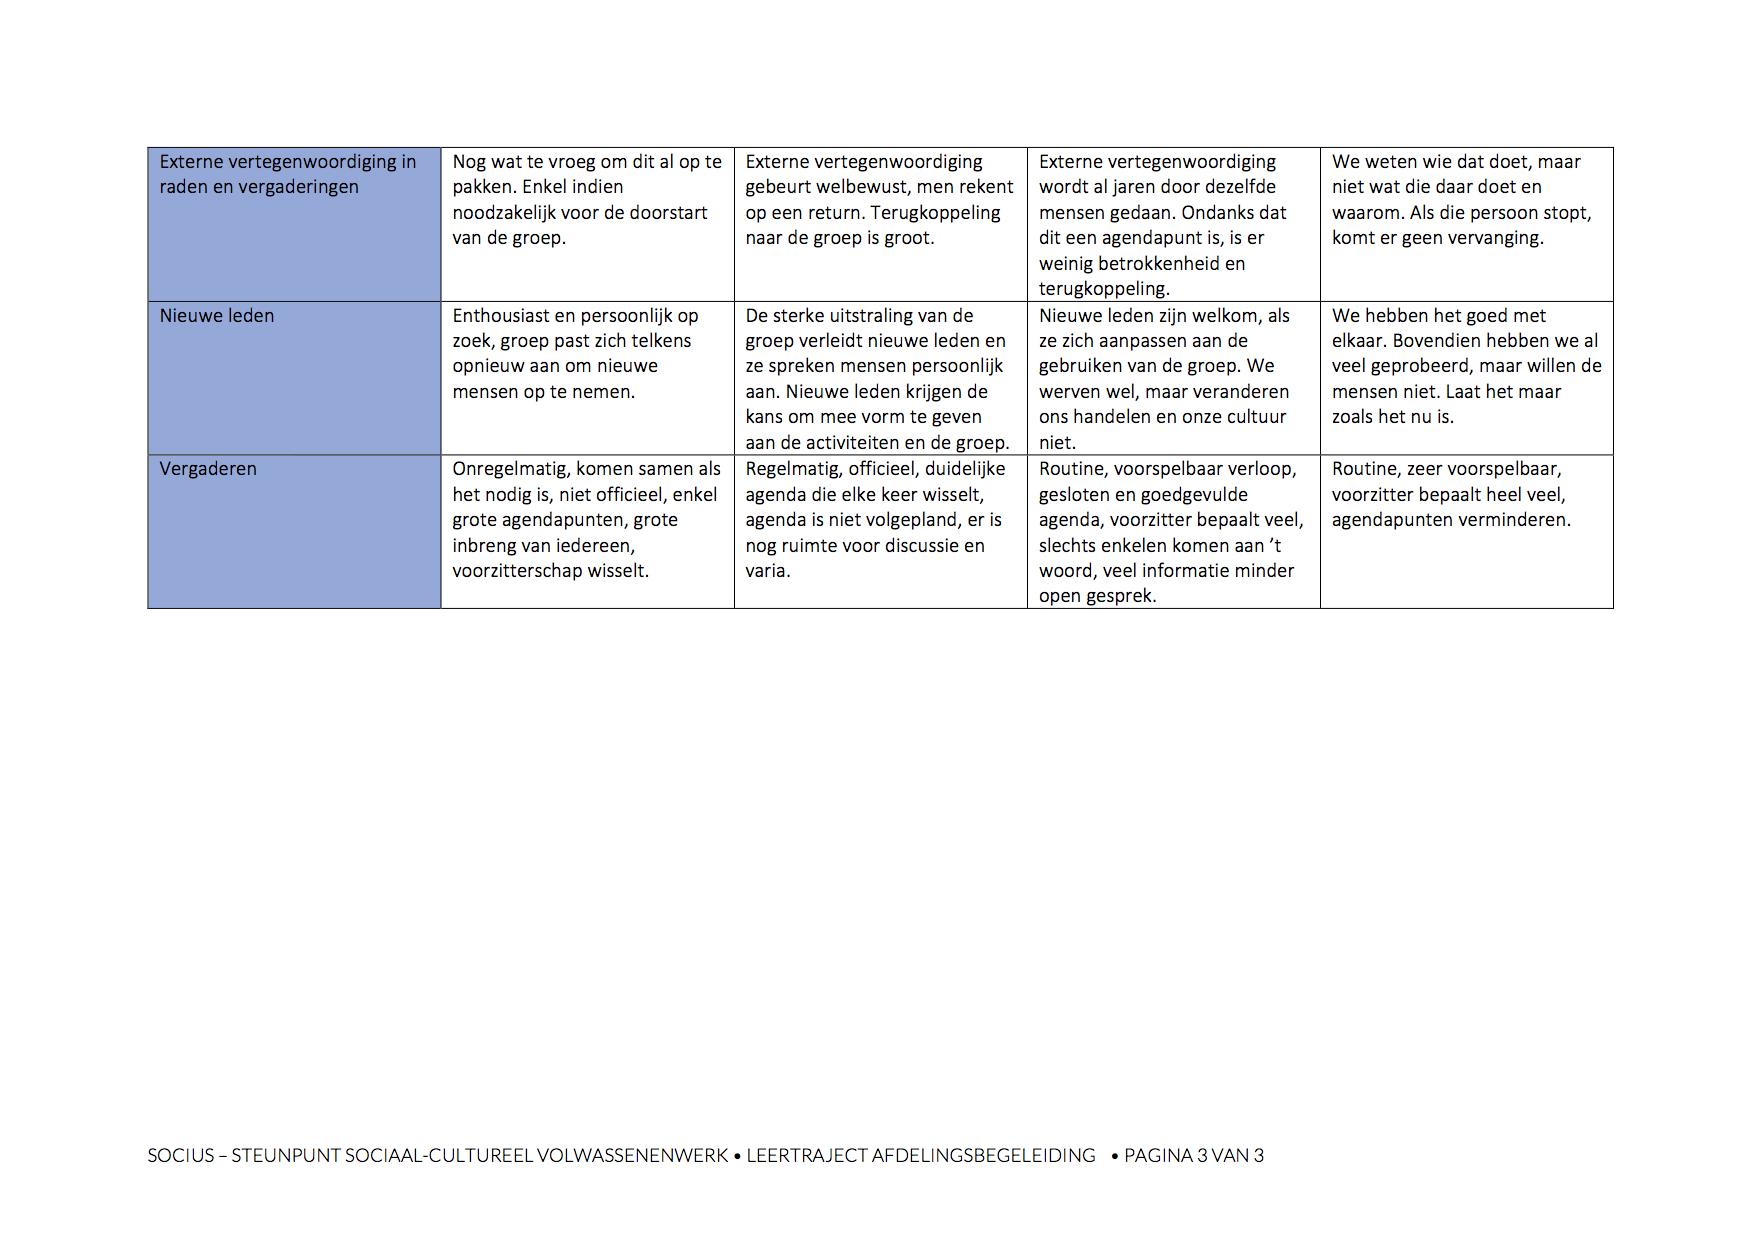 Kenmerken-per-levensfase-3